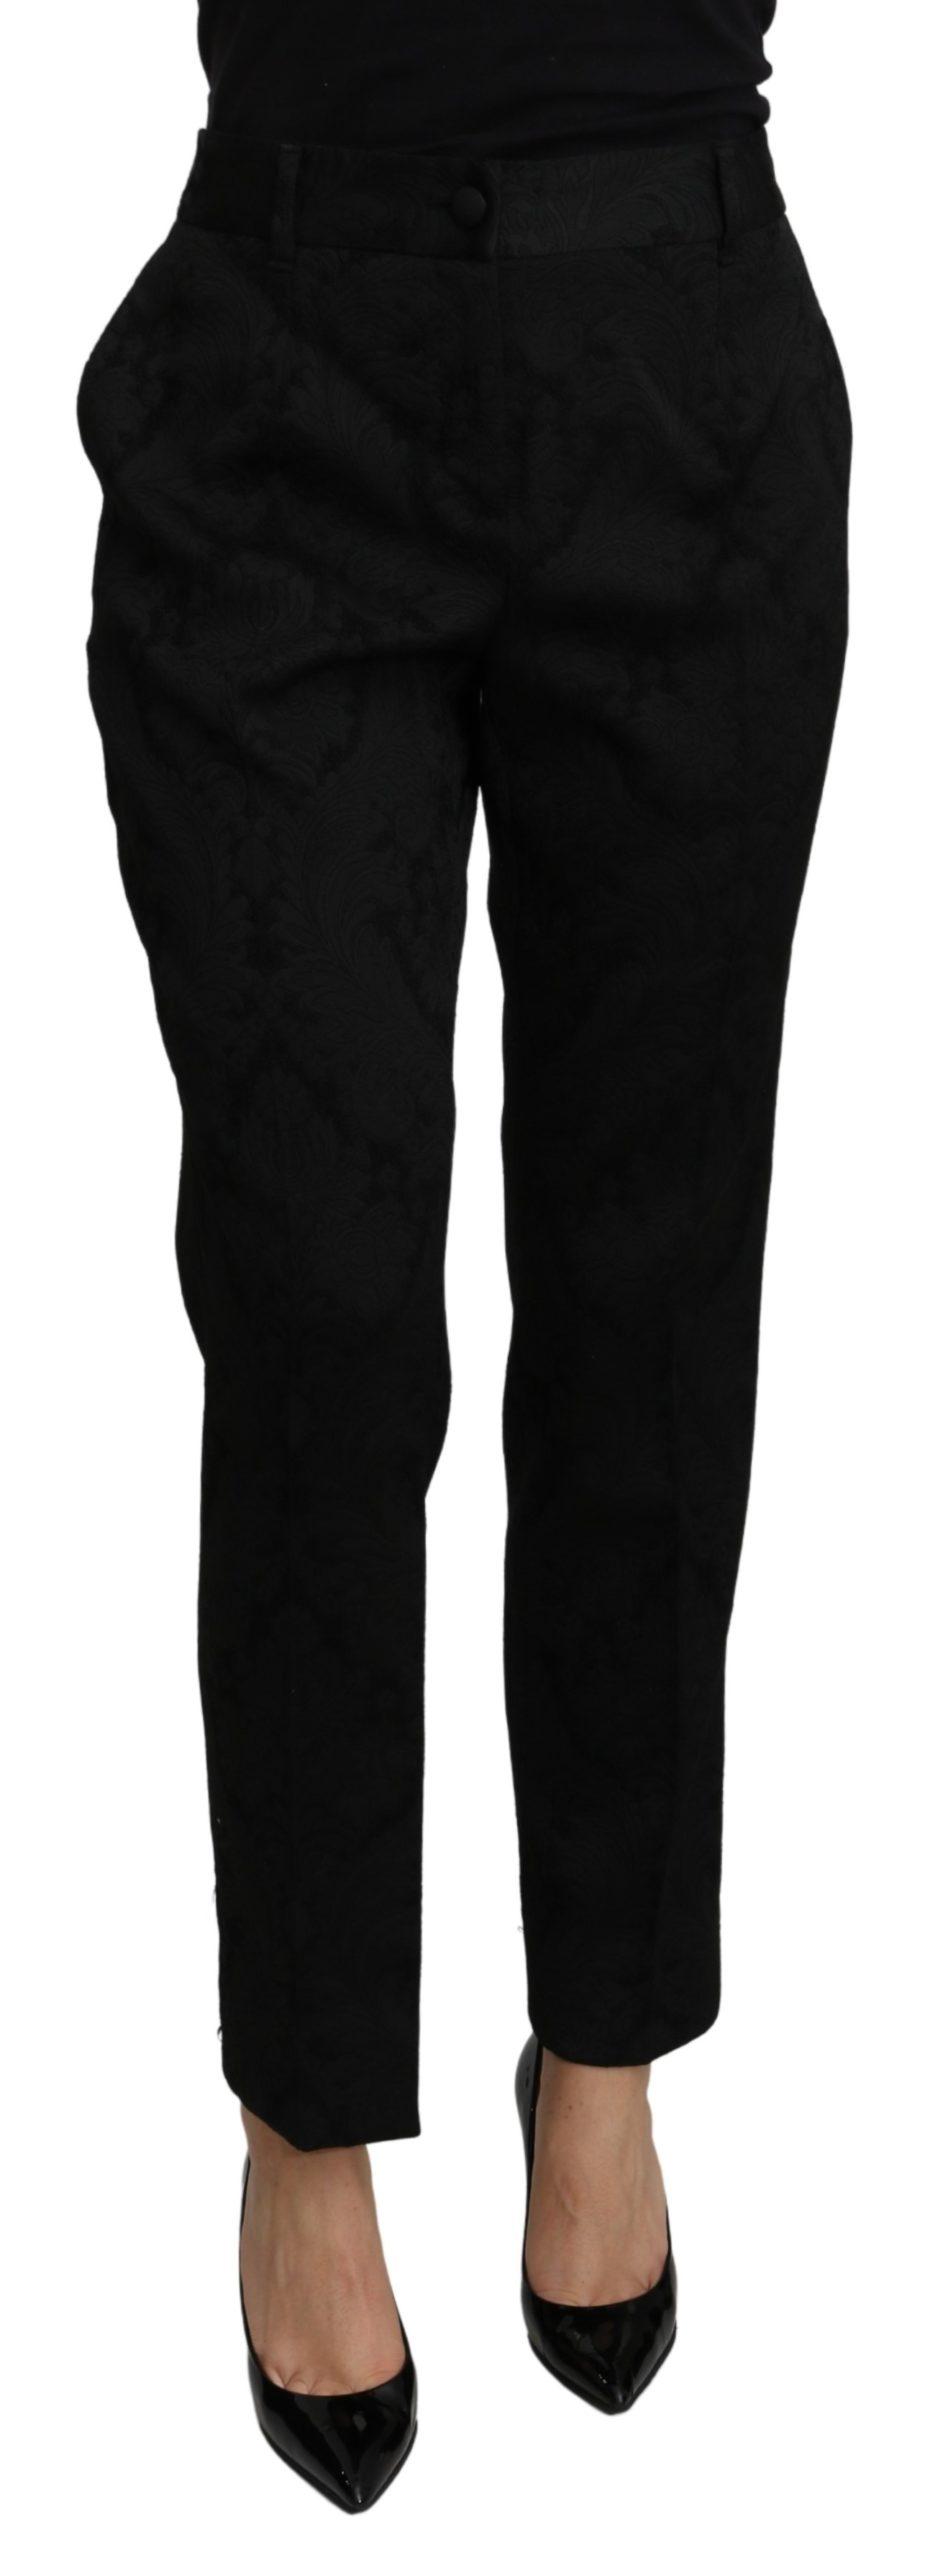 Dolce & Gabbana Women's Floral High Waist Trouser Black PAN71095 - IT44 L